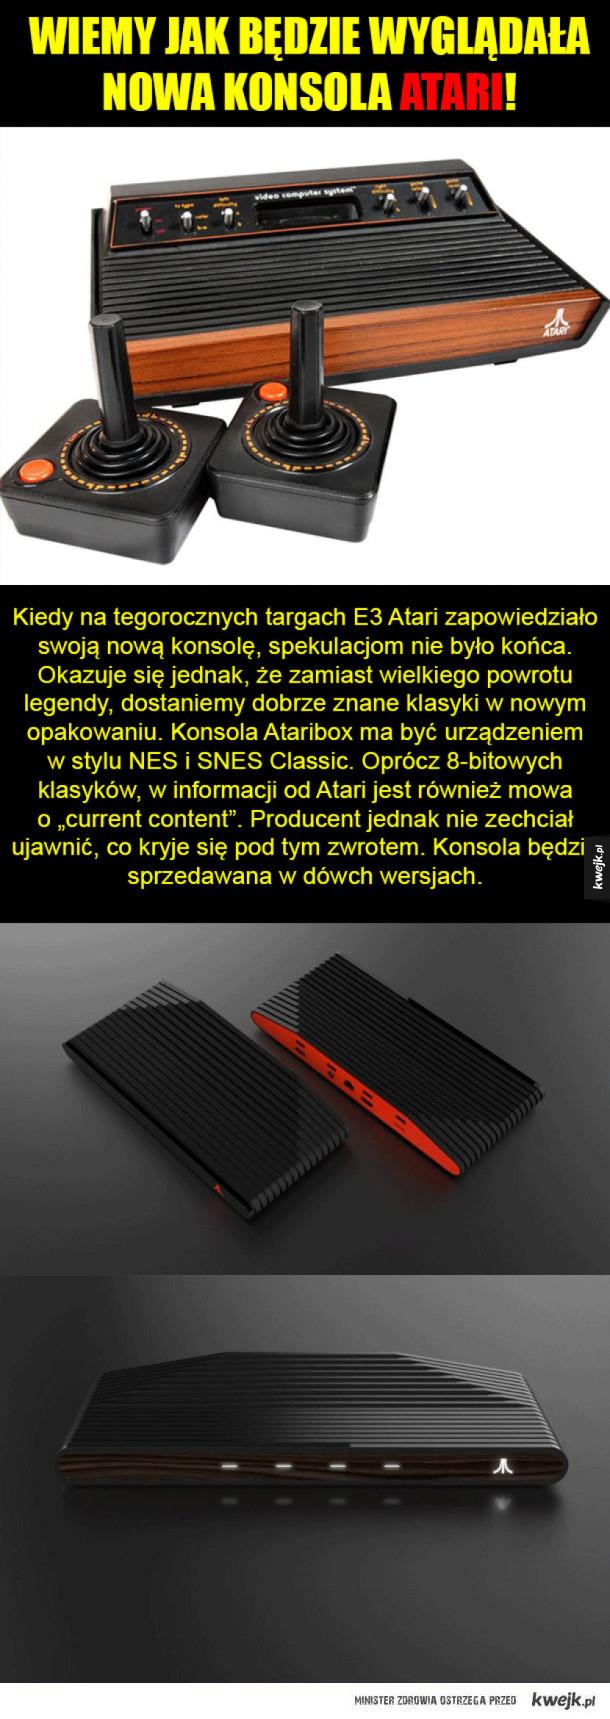 Nowa Konsola od Atari!